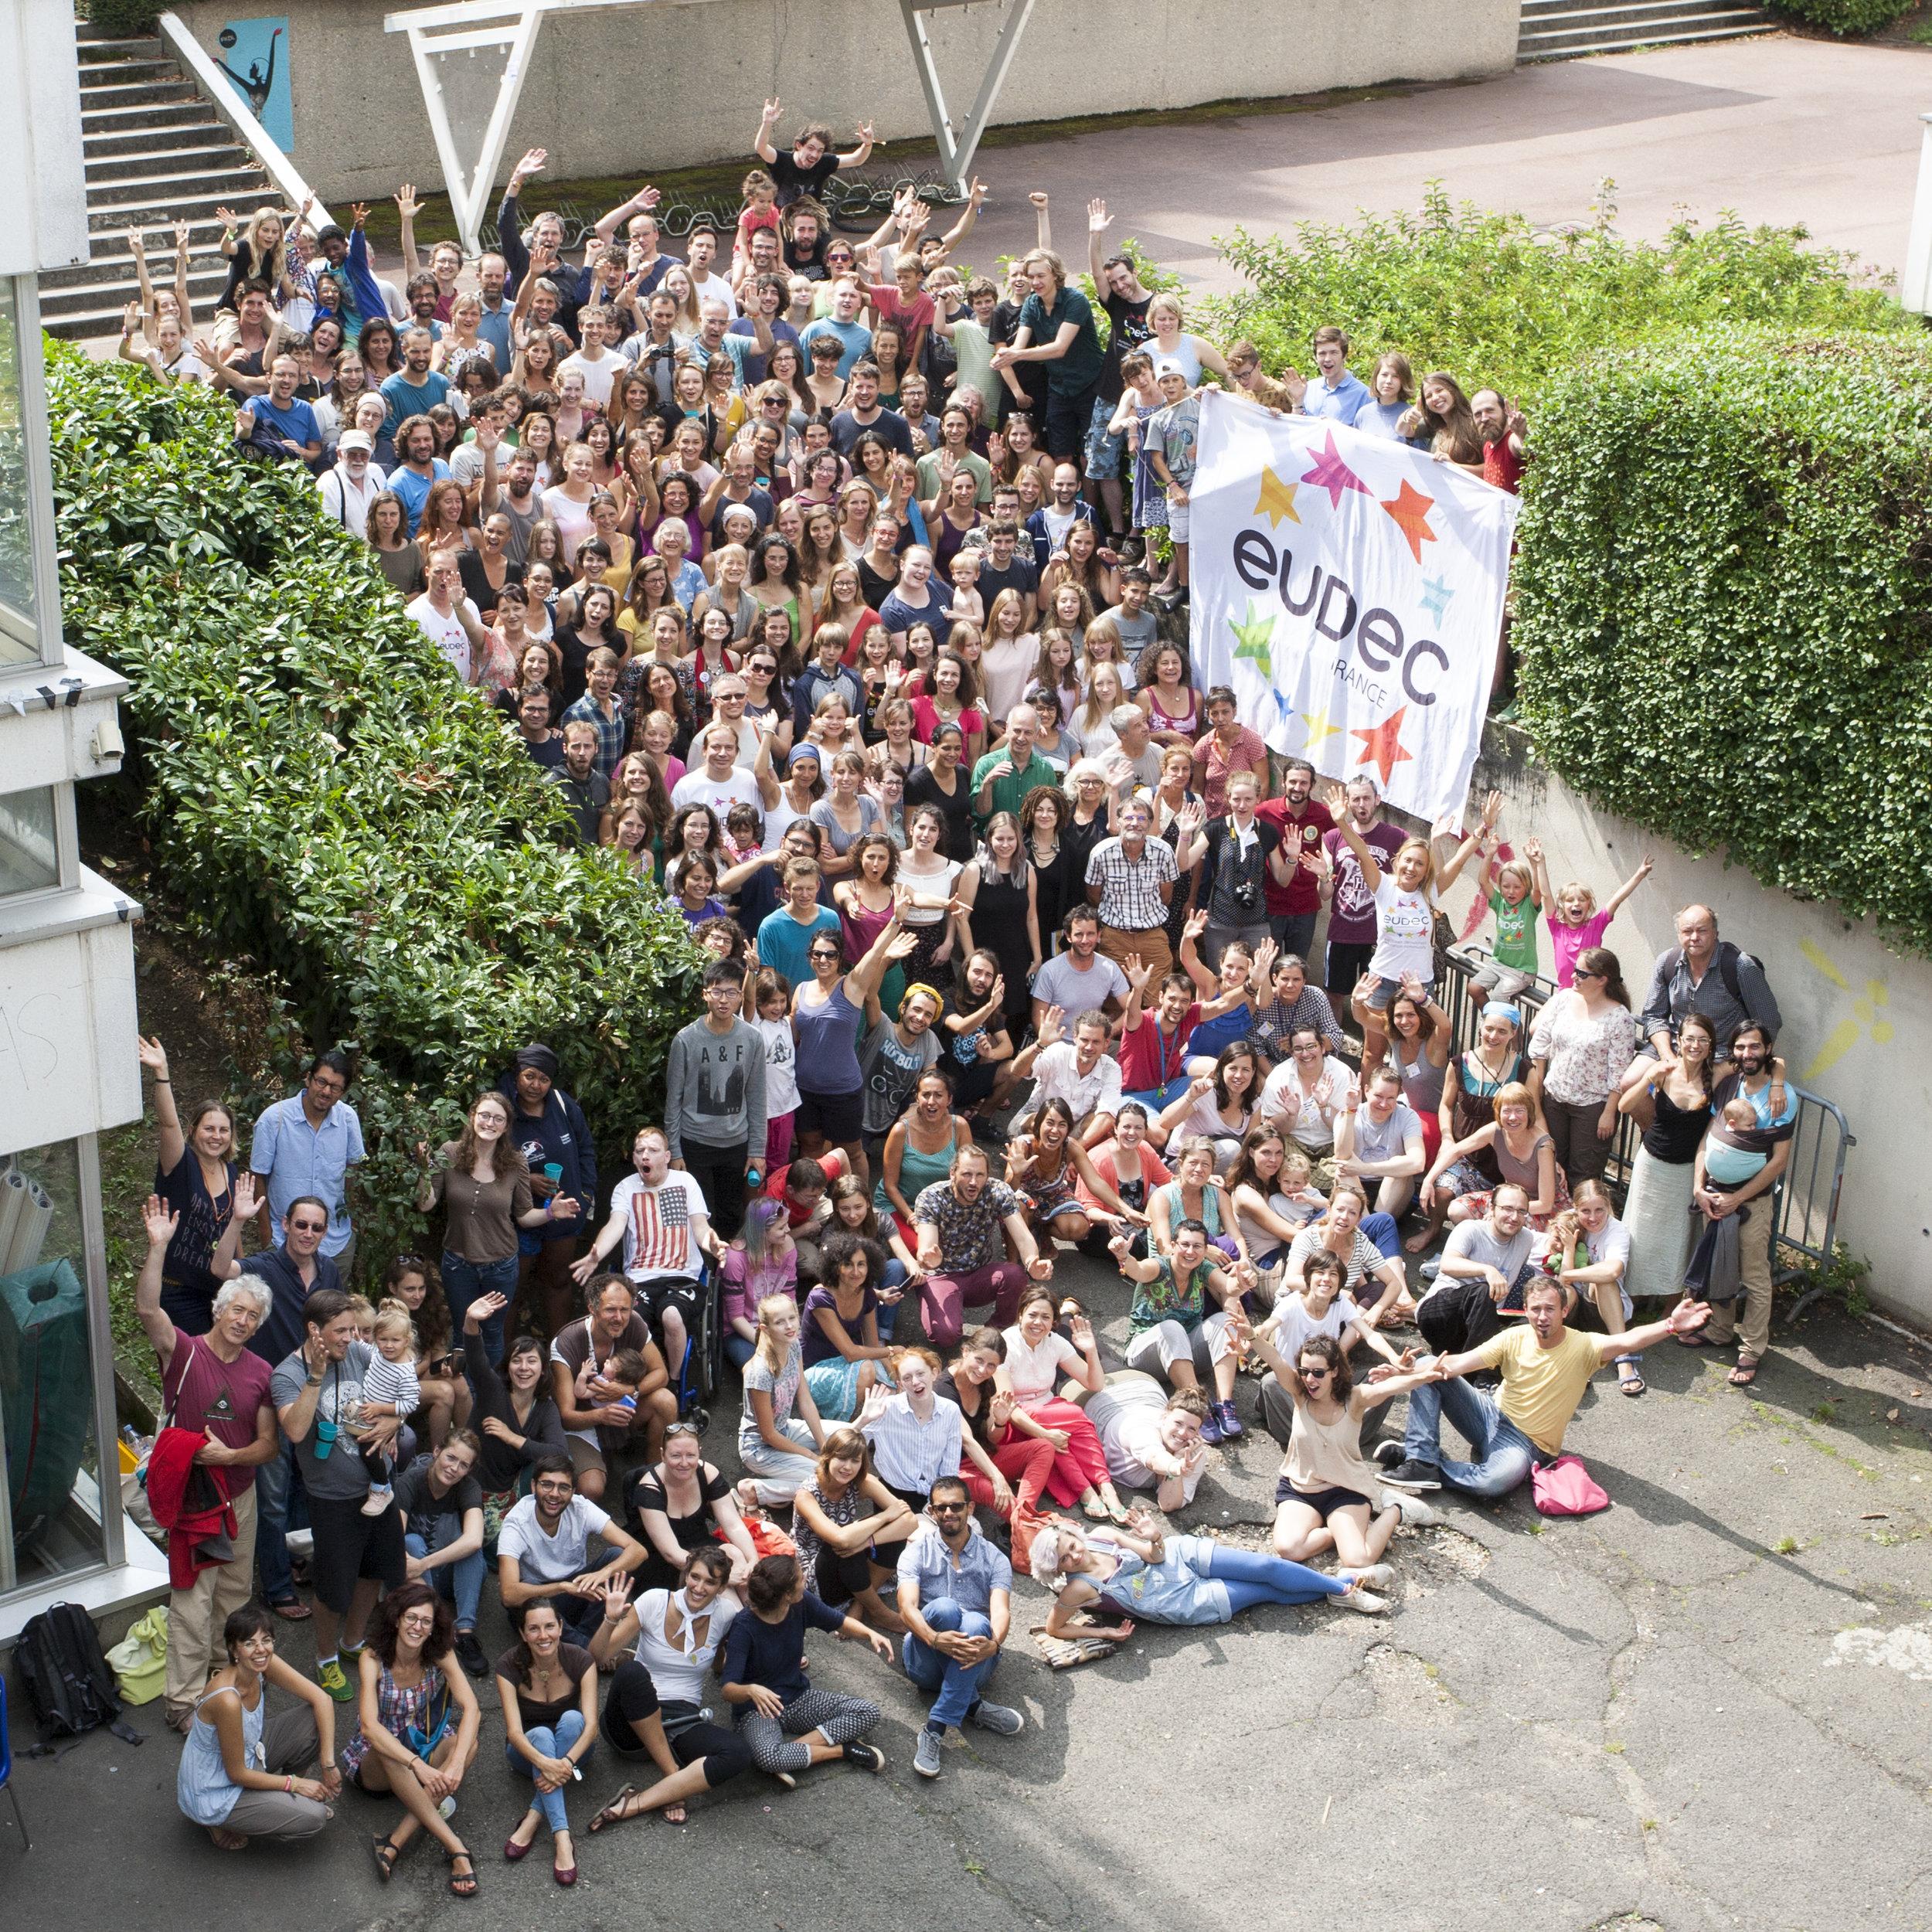 rencontre gay paris 19 à Châtenay Malabry